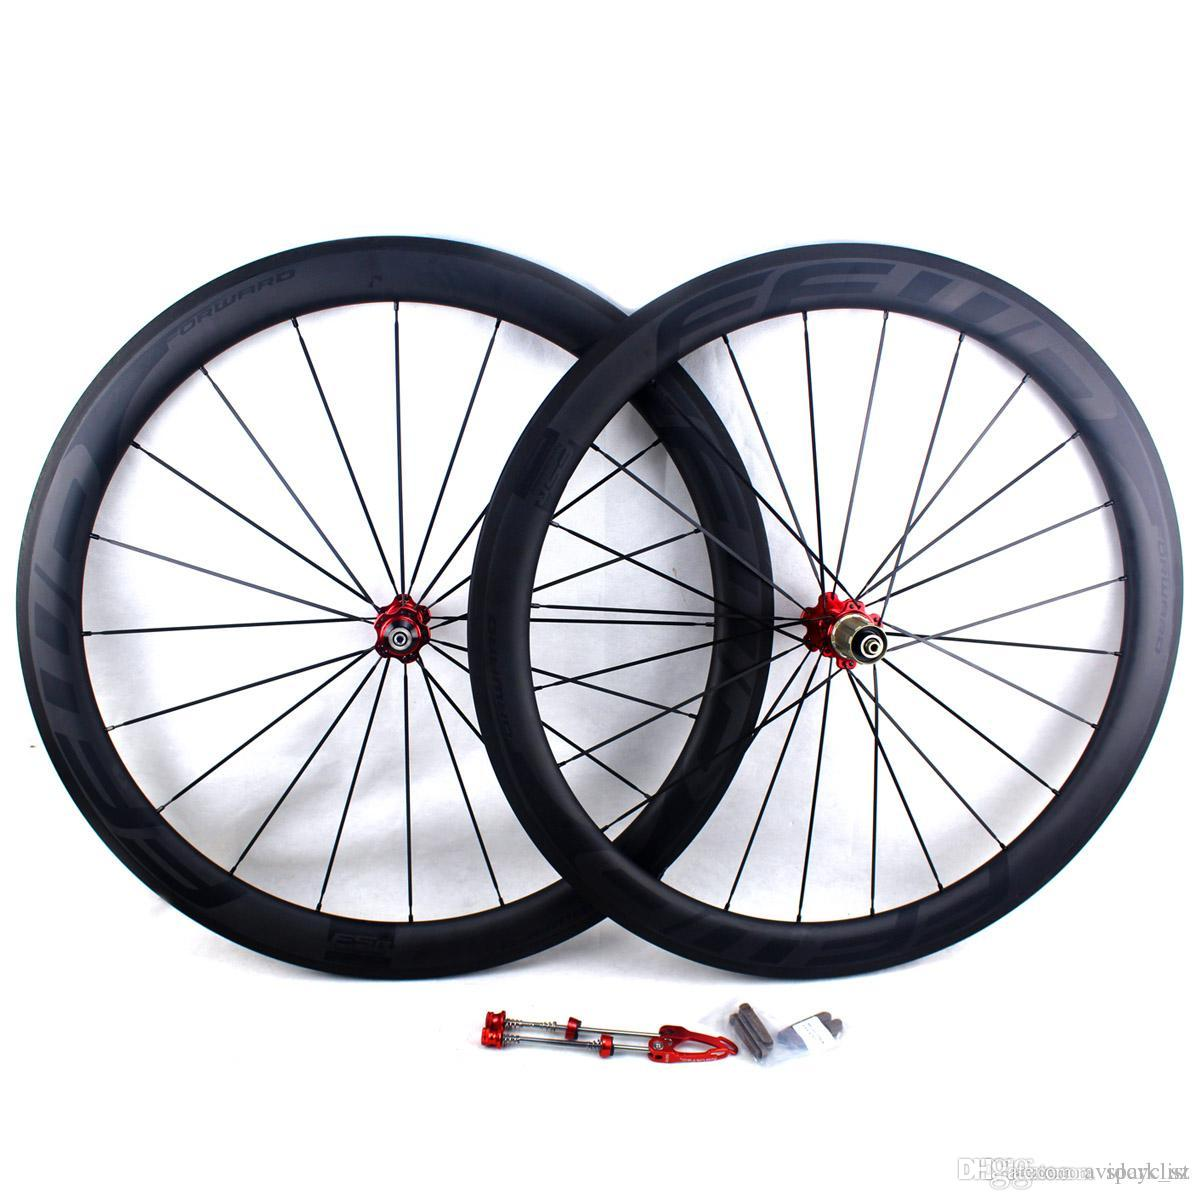 carbon fiber bike road wheels 50mm FFWD F5R BOB basalt brake surface clincher tubular road bicycle racing wheelset rim width 25mm UD matt